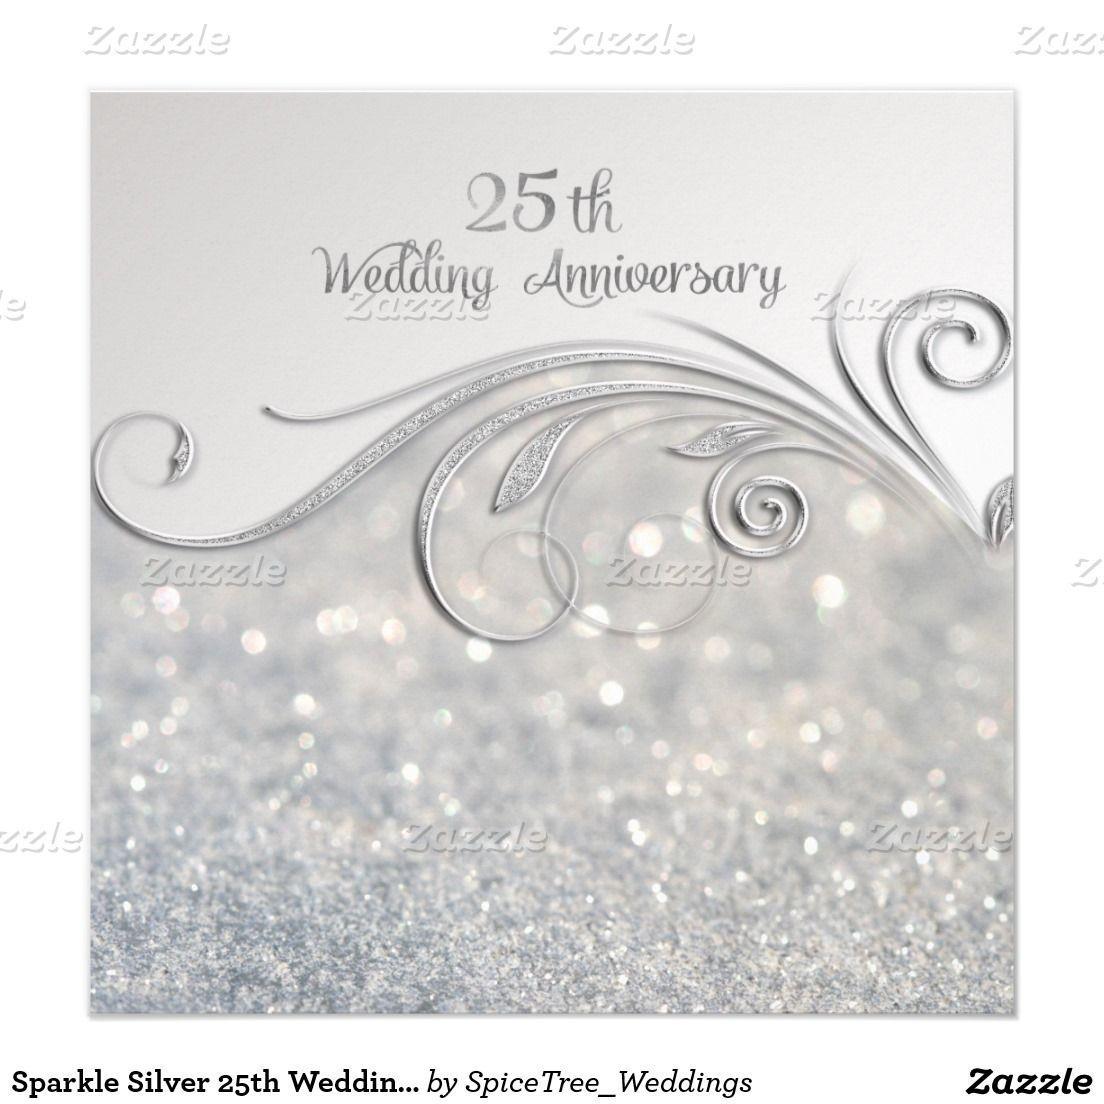 Silver Wedding Anniversary Gowns: Sparkle Silver 25th Wedding Anniversary Invitation